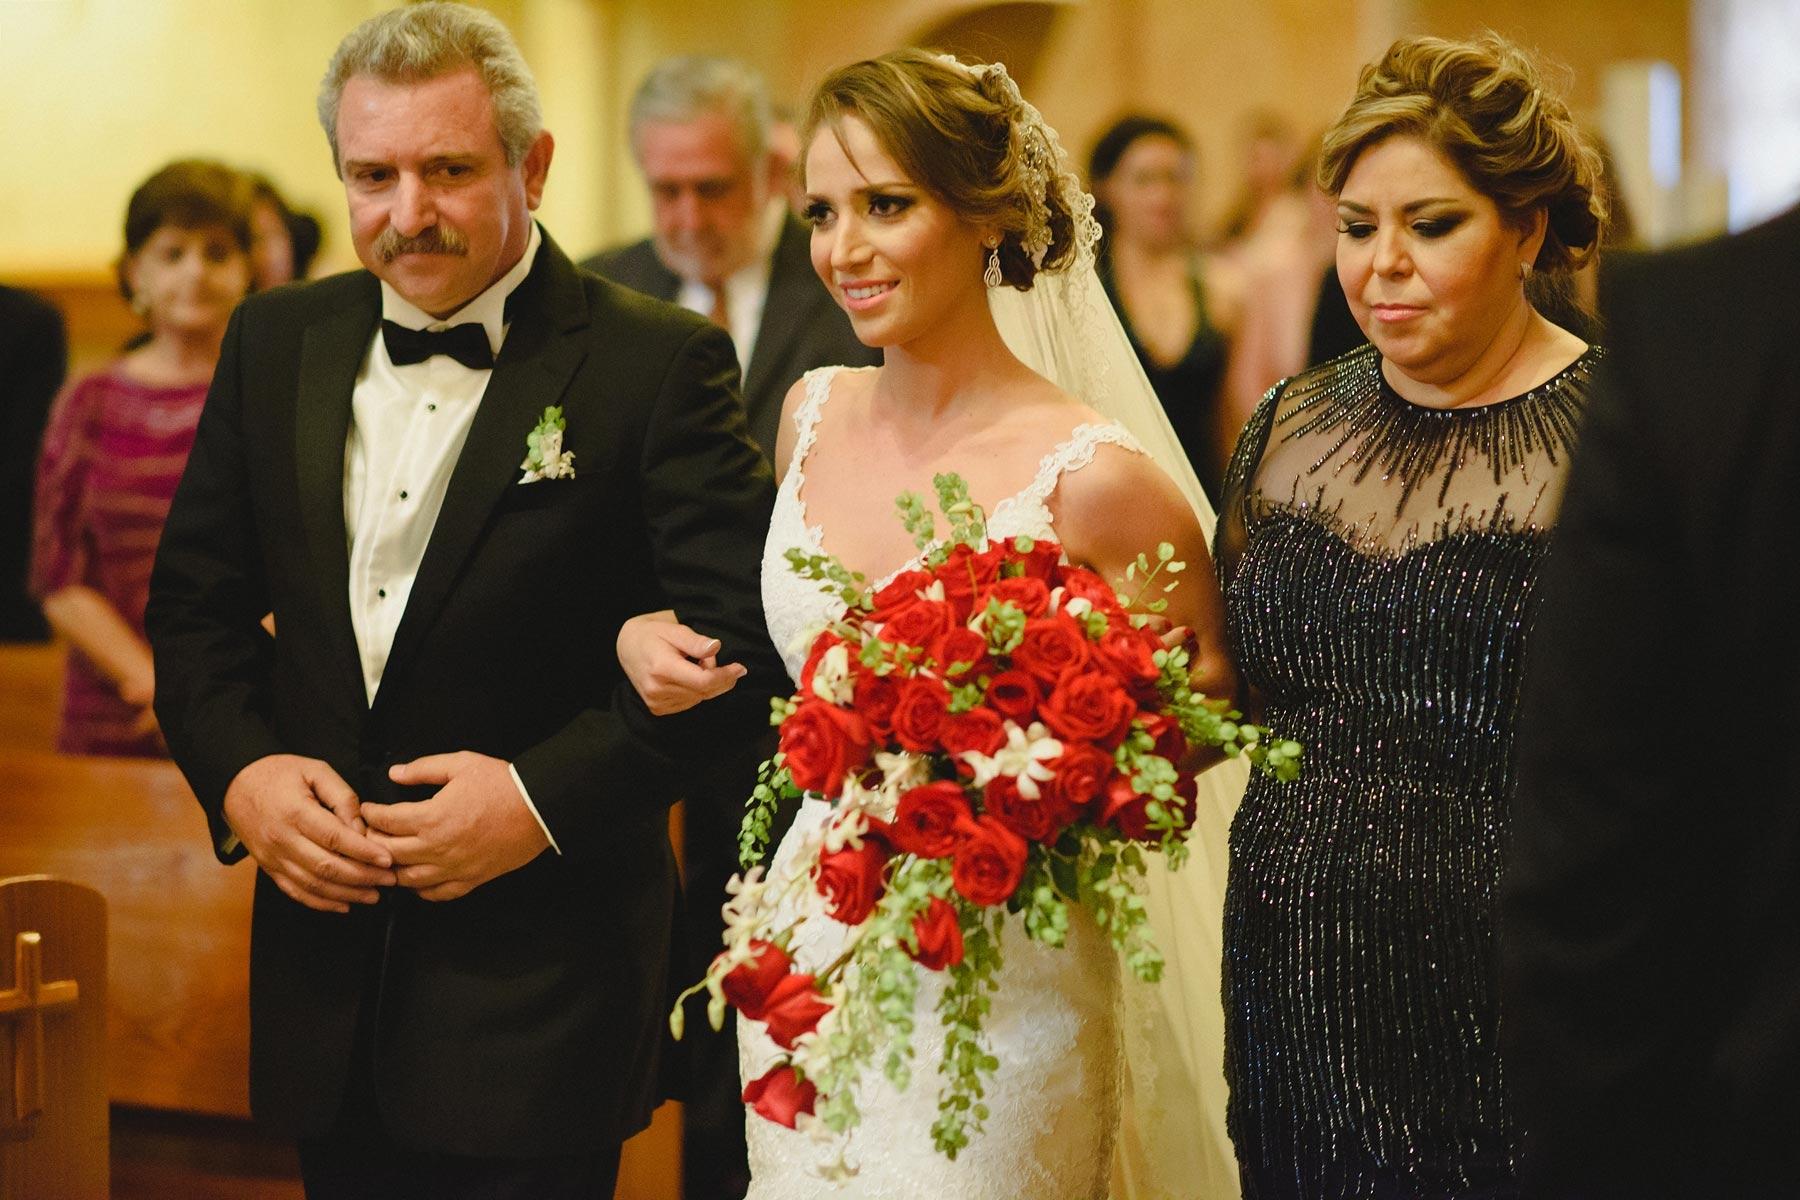 brides dad down the aisle